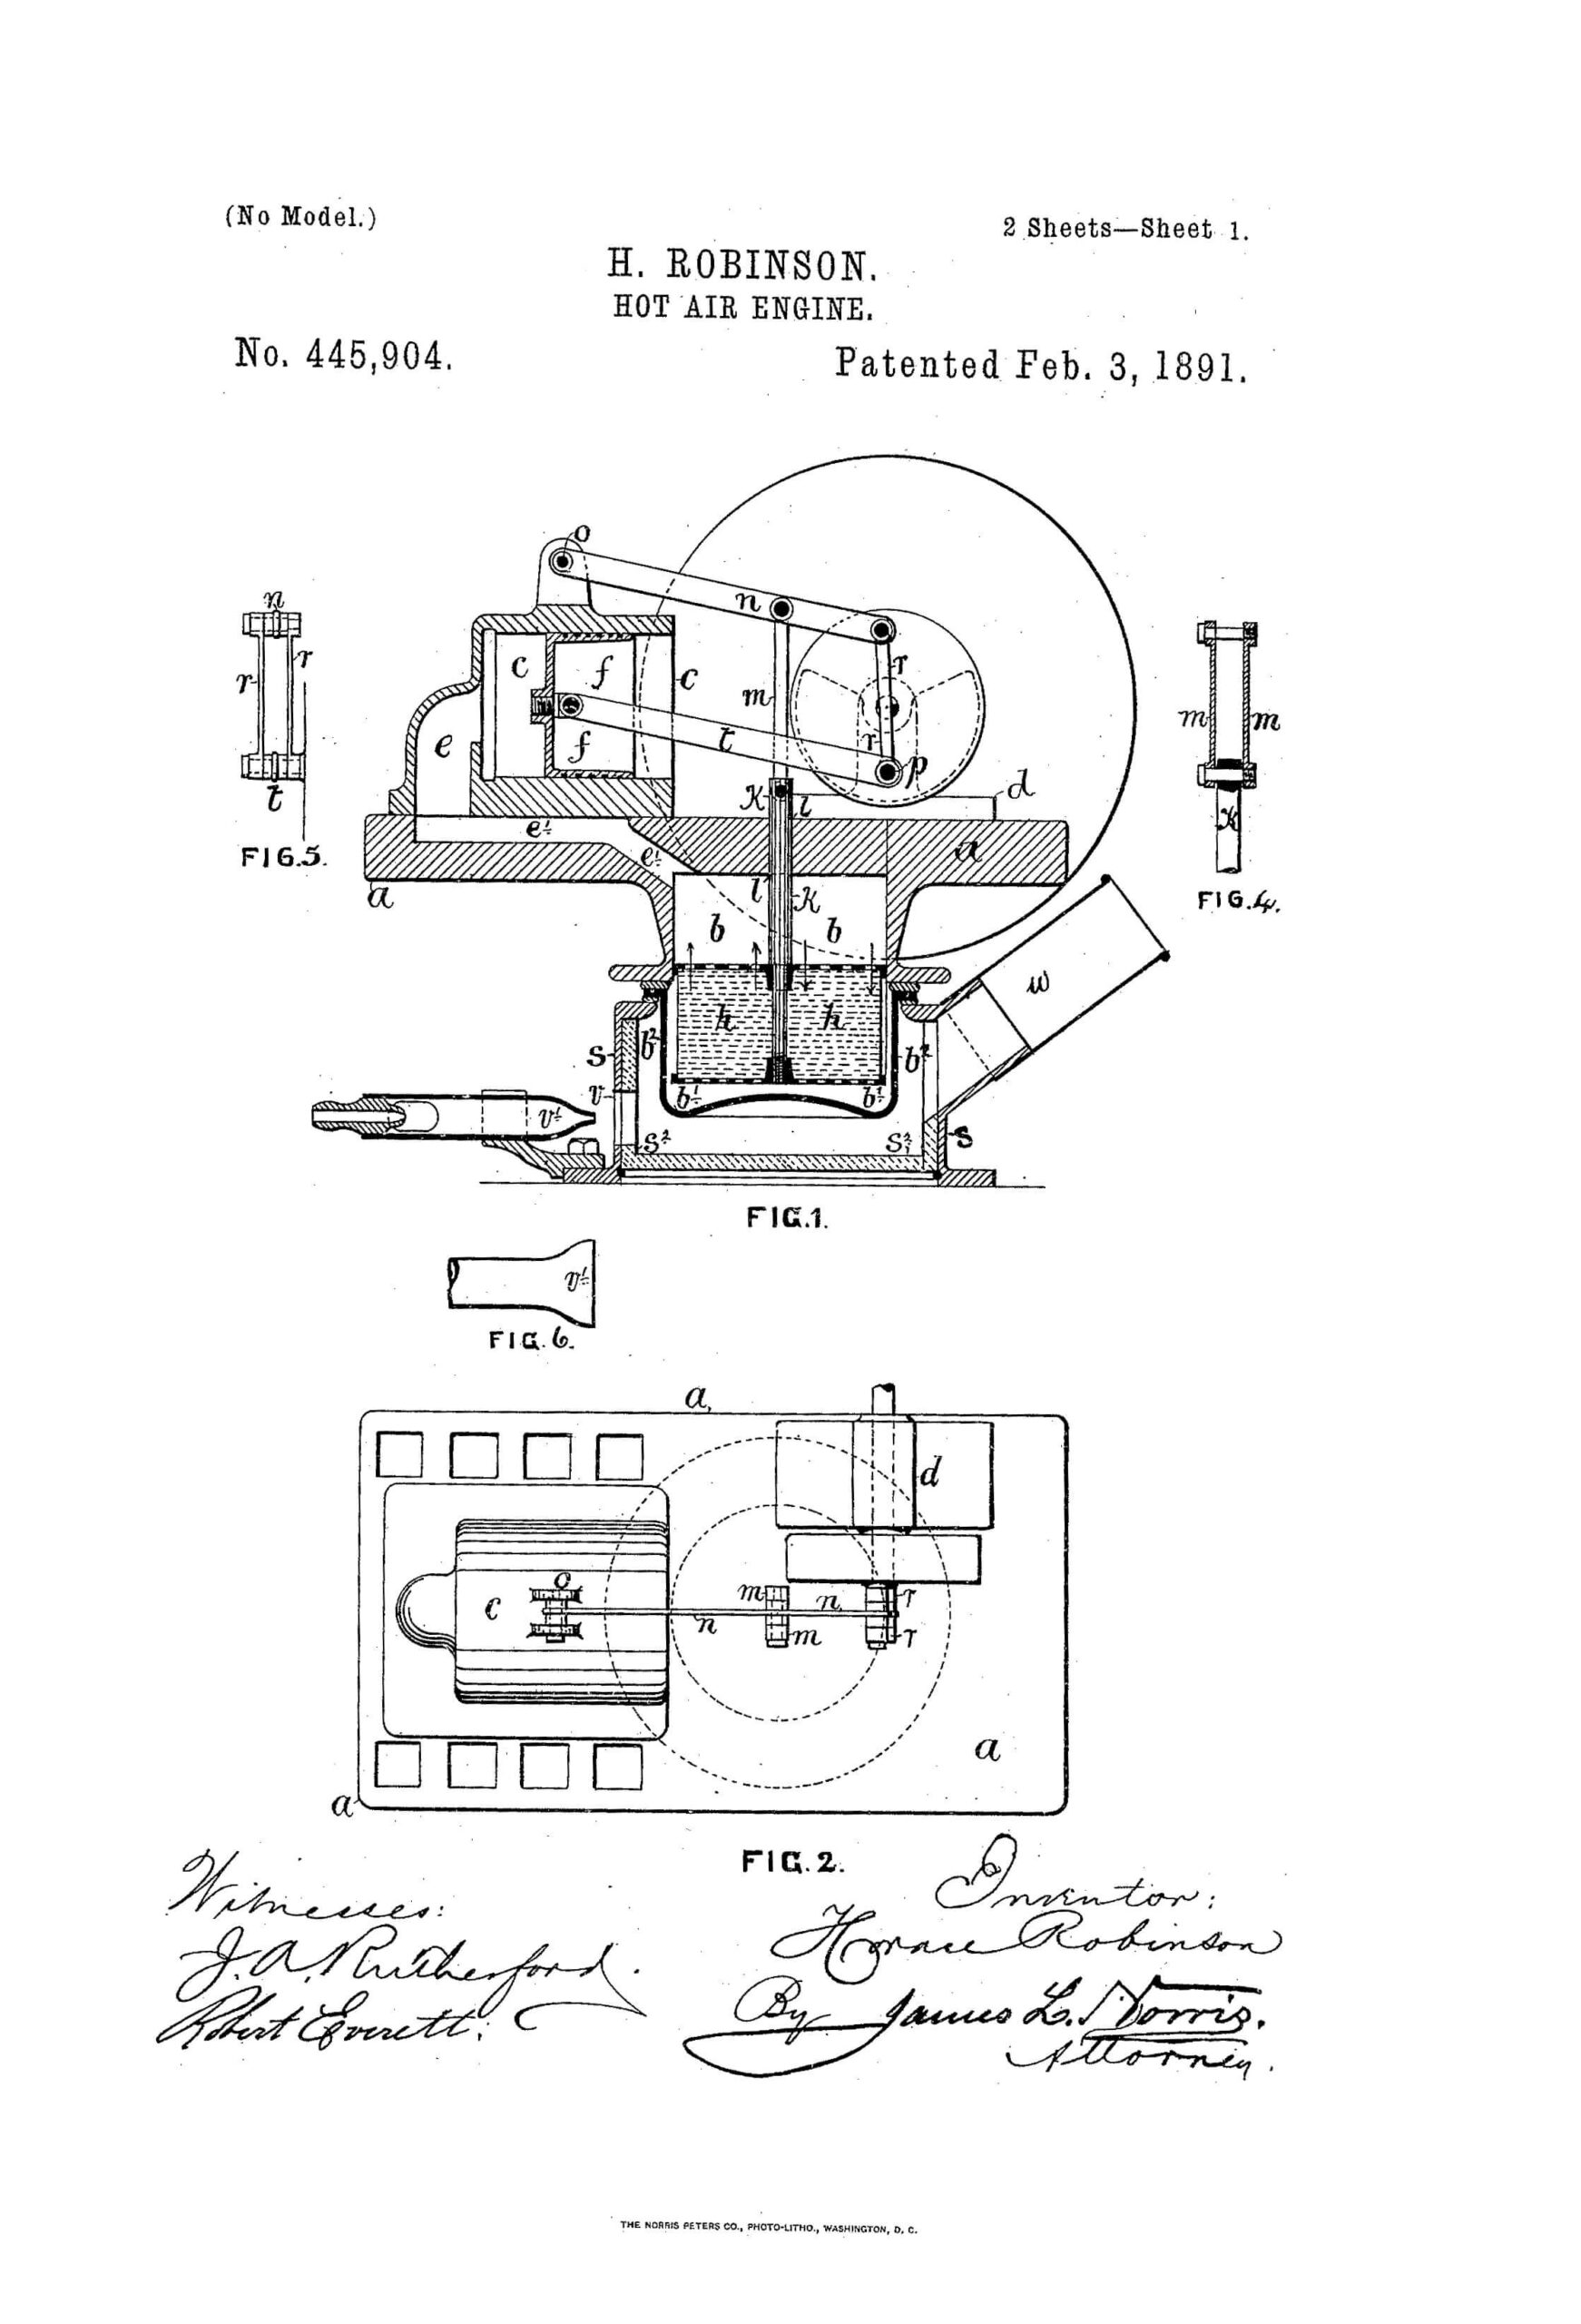 Robinson Hot Air Engine Patent